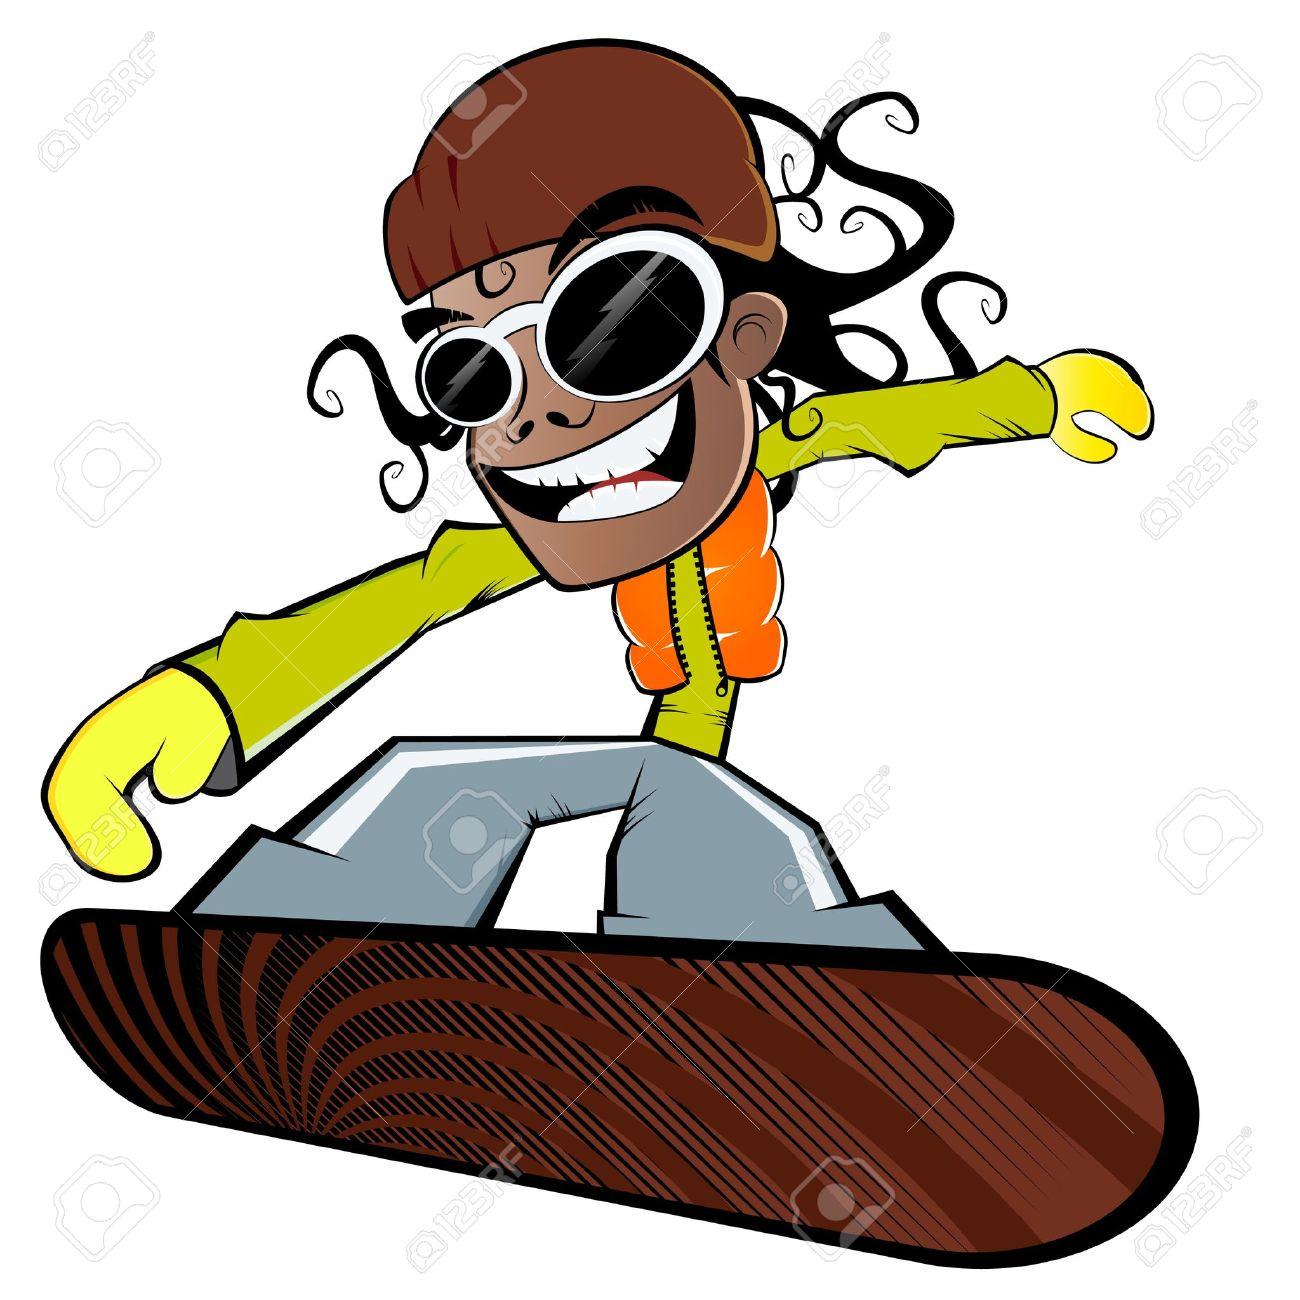 1300x1300 Funny Cartoon Snowboarder Royalty Free Cliparts, Vectors,